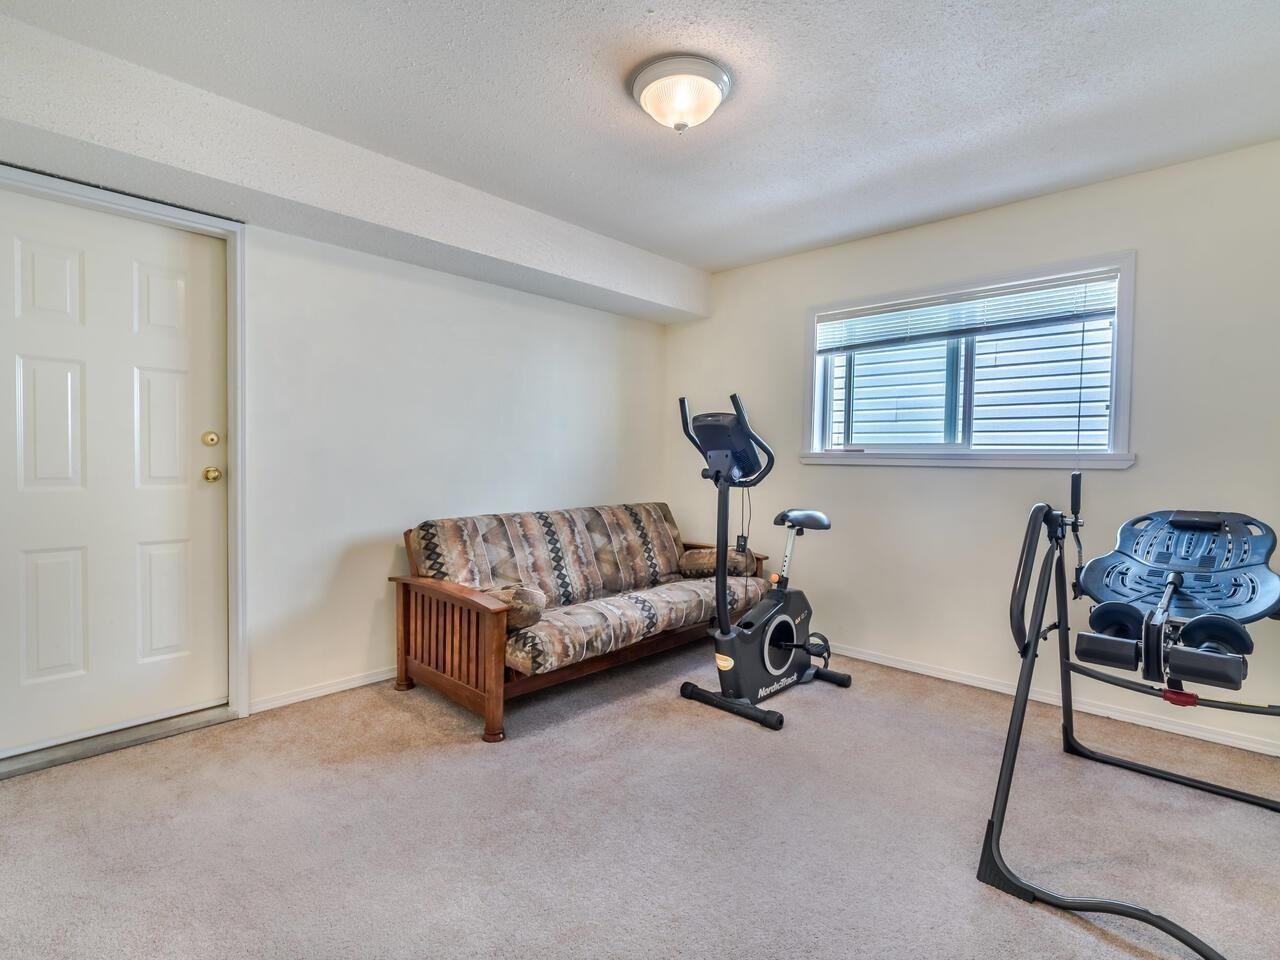 Photo 26: Photos: 5602 WILSON Court in Richmond: Hamilton RI House for sale : MLS®# R2602420